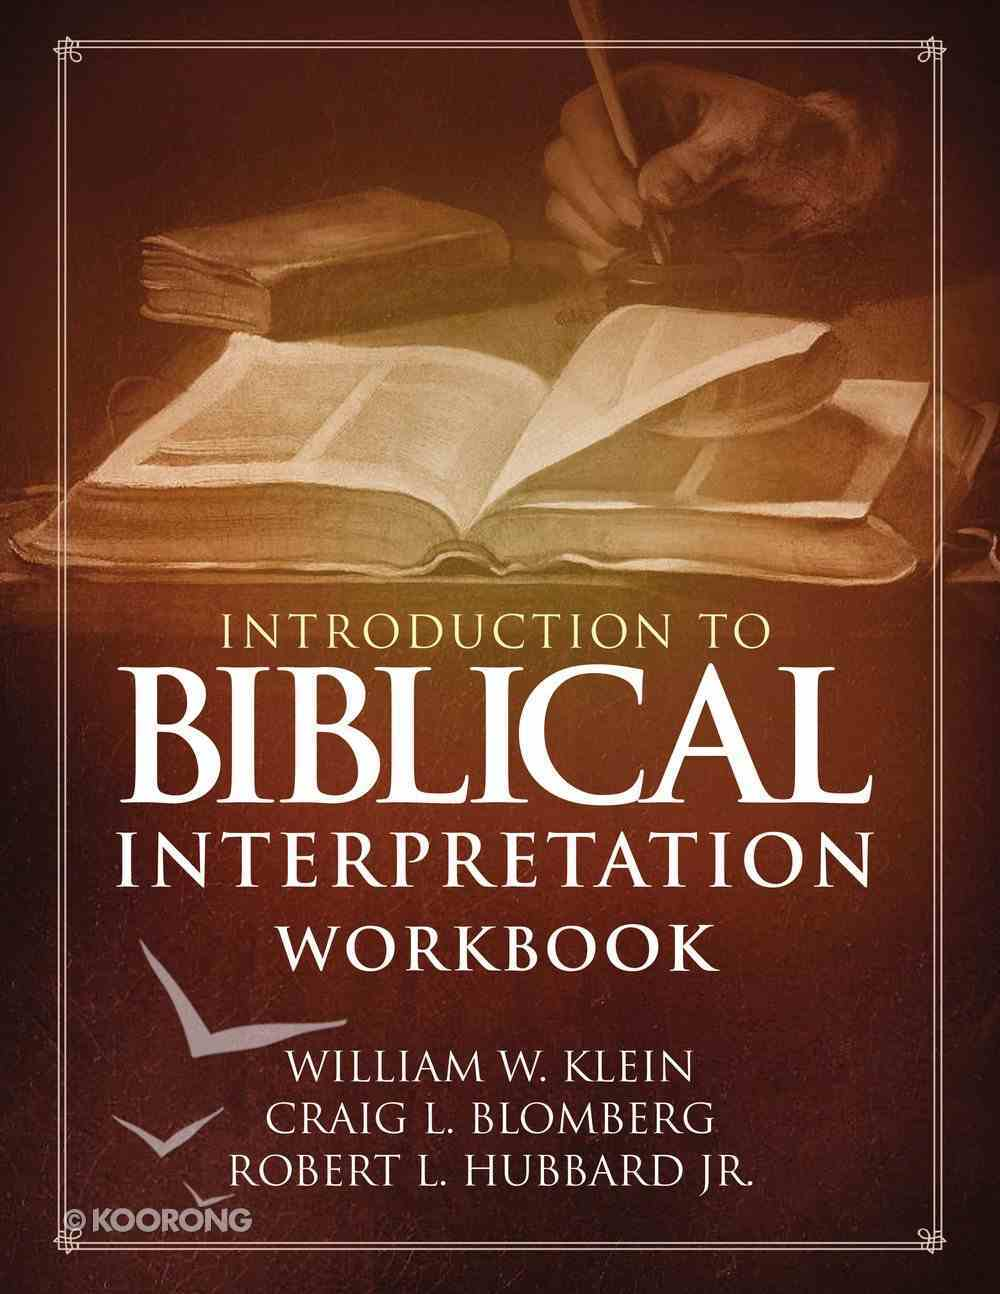 Introduction to Biblical Interpretation (Workbook) Paperback